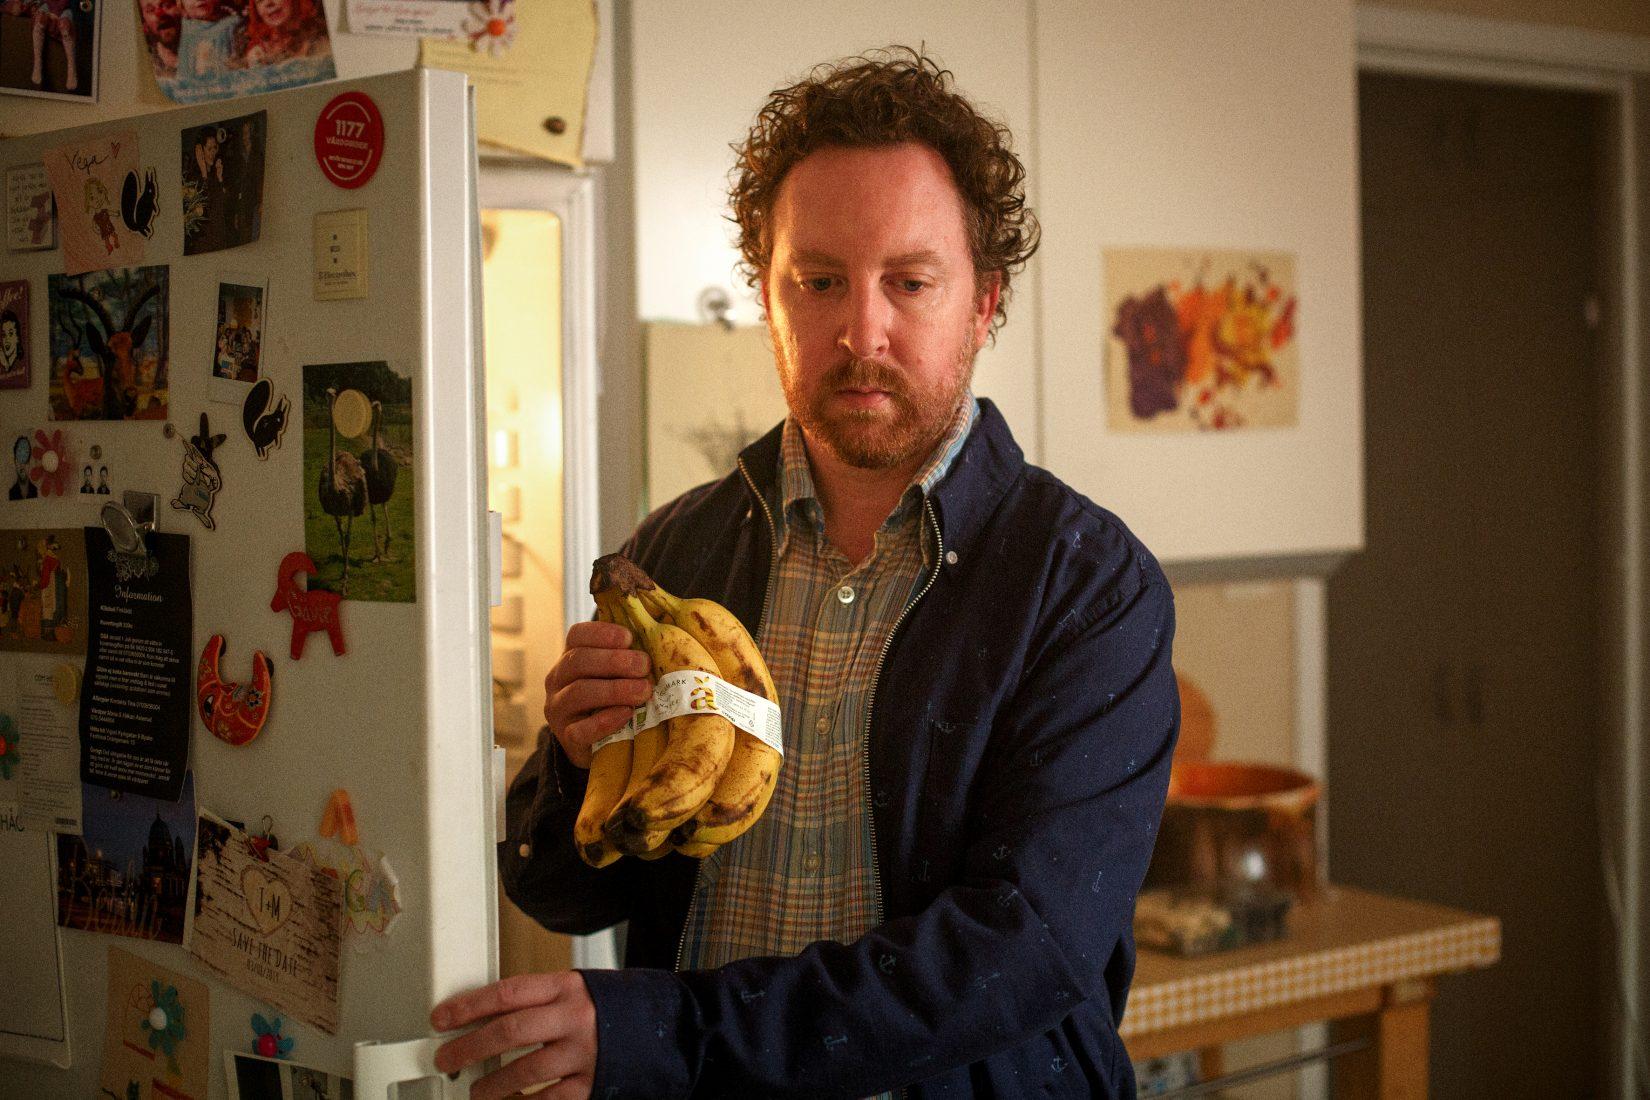 Un homme pensif tient des bananes dans sa main devant un frigo